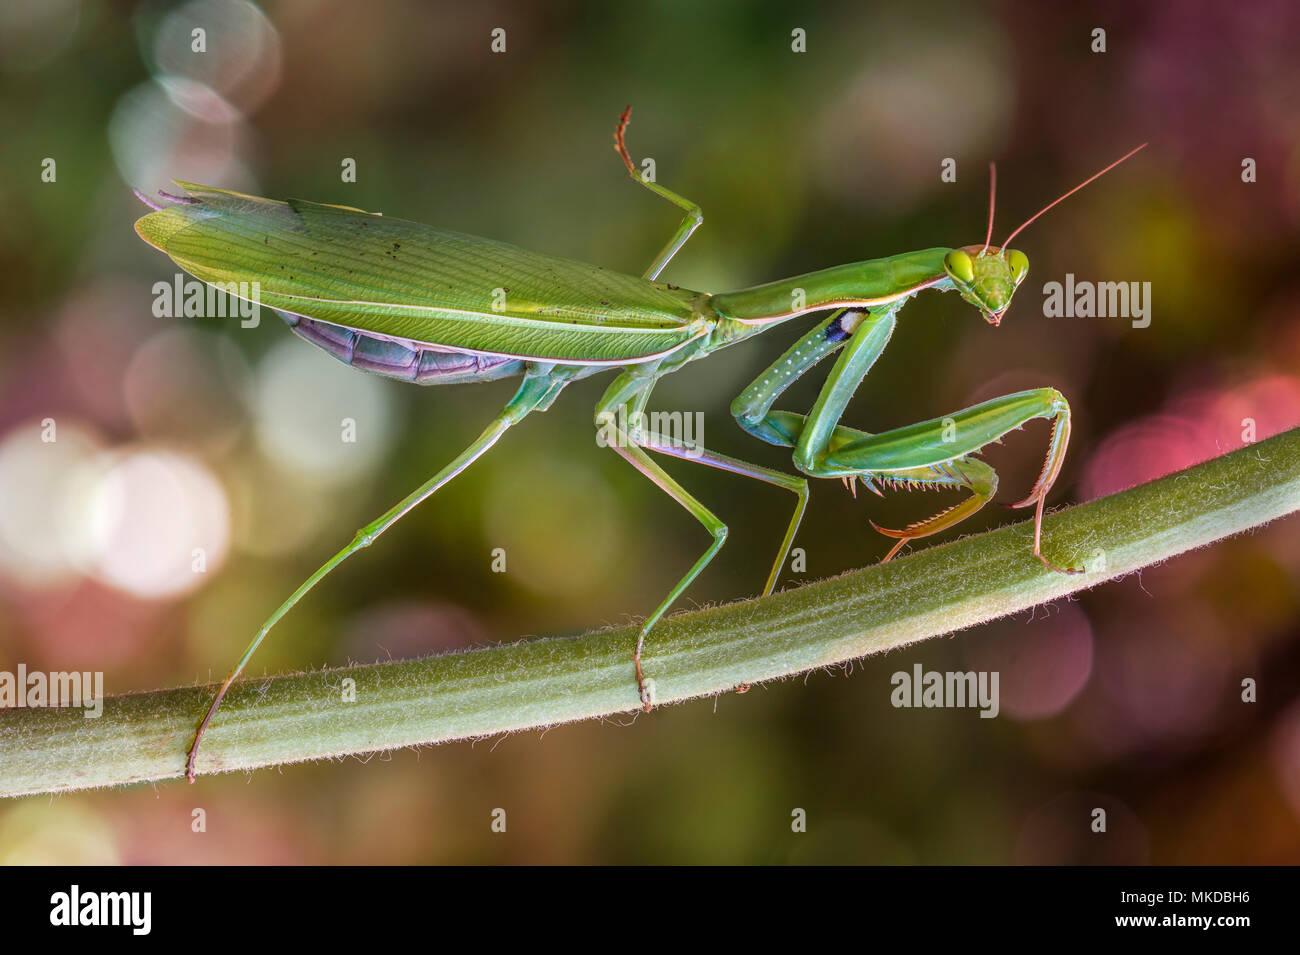 Praying mantis (Mantis religiosa) female on a stem - Stock Image